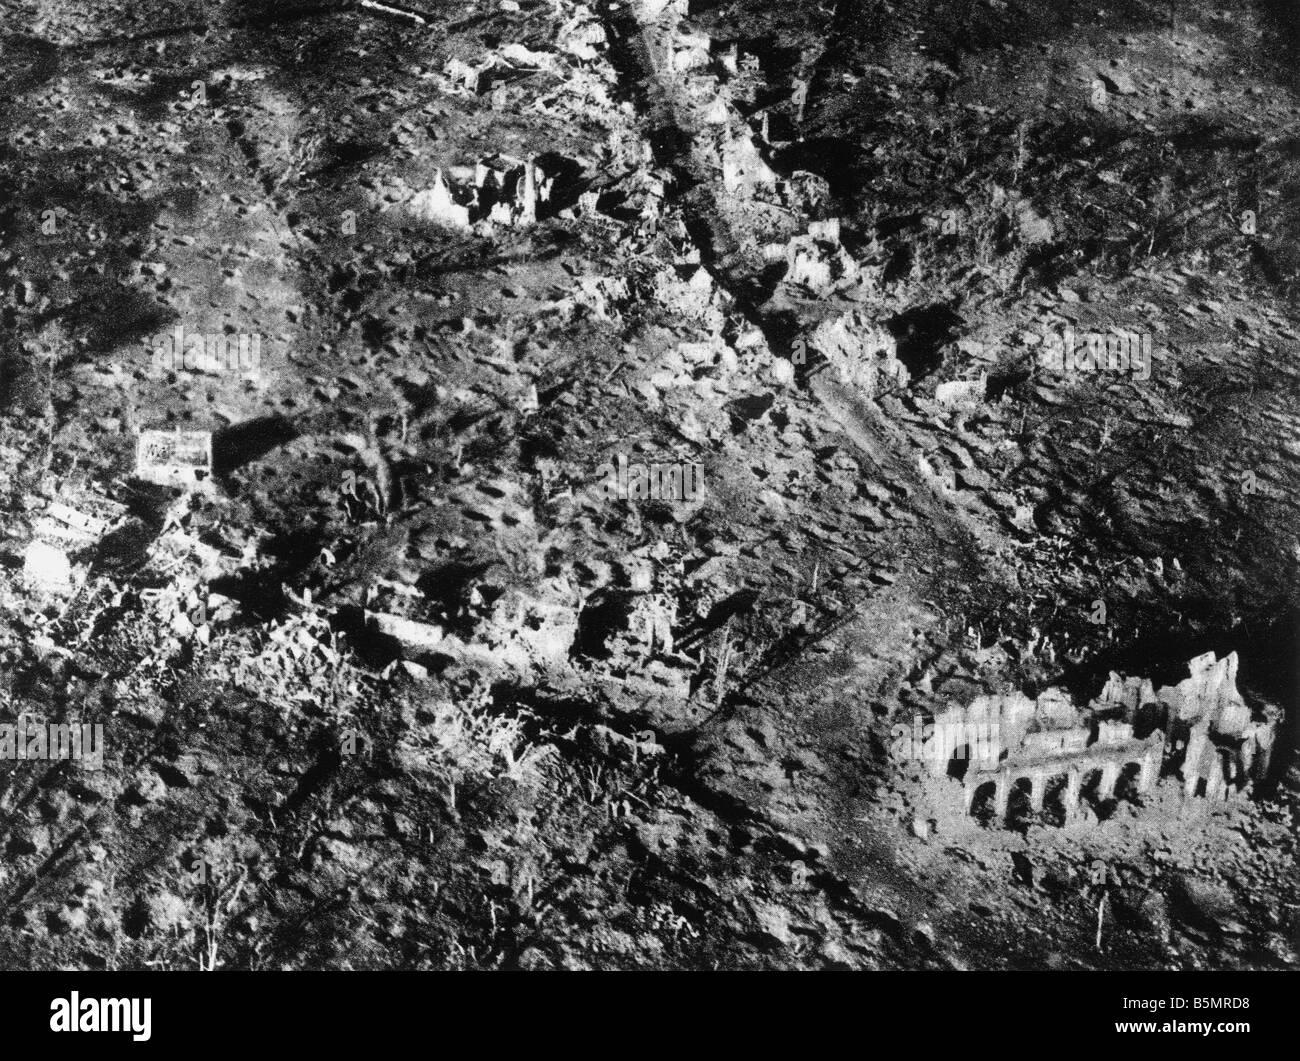 9 1917 11 10 A1 E Destroyed village Paschendael 1917 World War 1 1914 18 Western Front Battle of Flanders 31st July - Stock Image